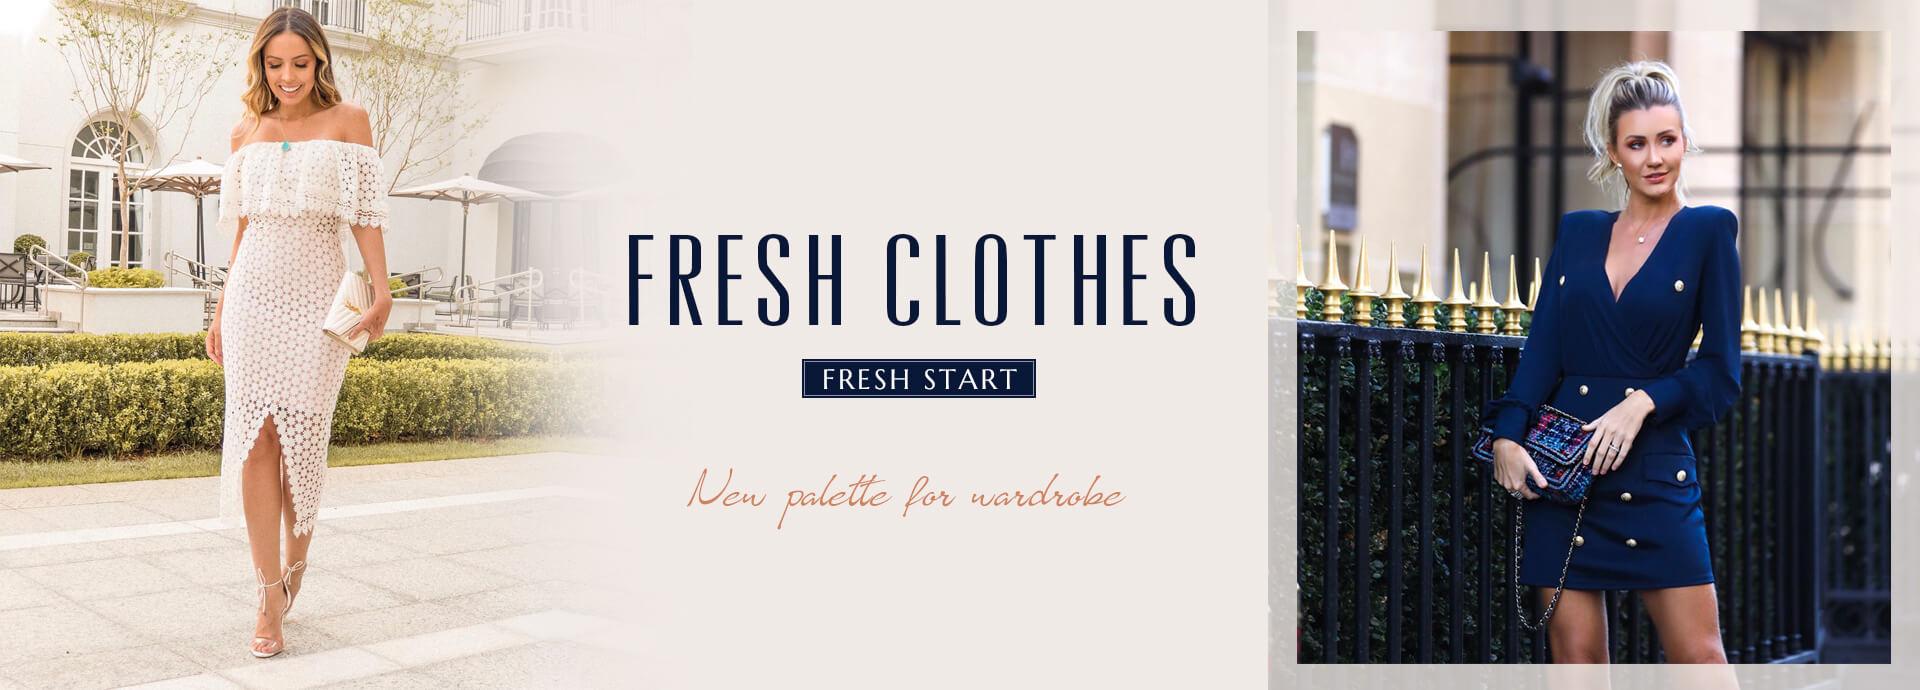 Fresh Clothes  Fresh Start